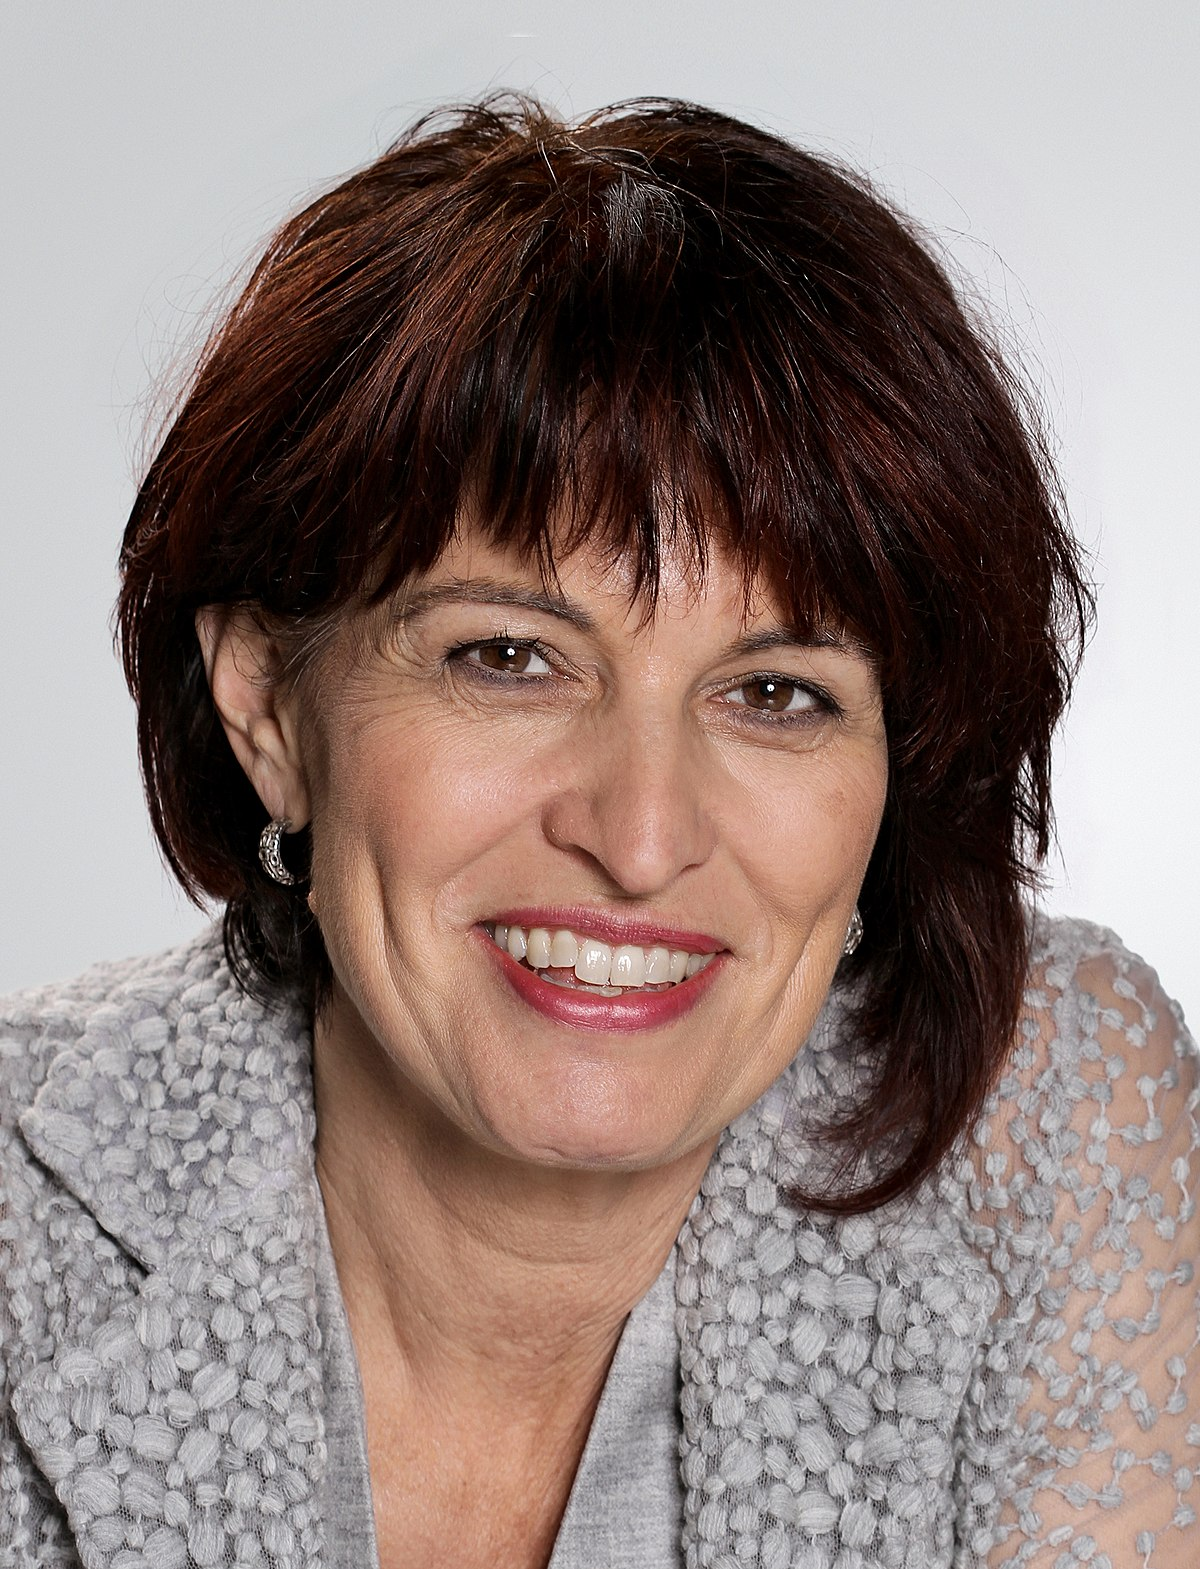 Doris Seidler - Wikipedia